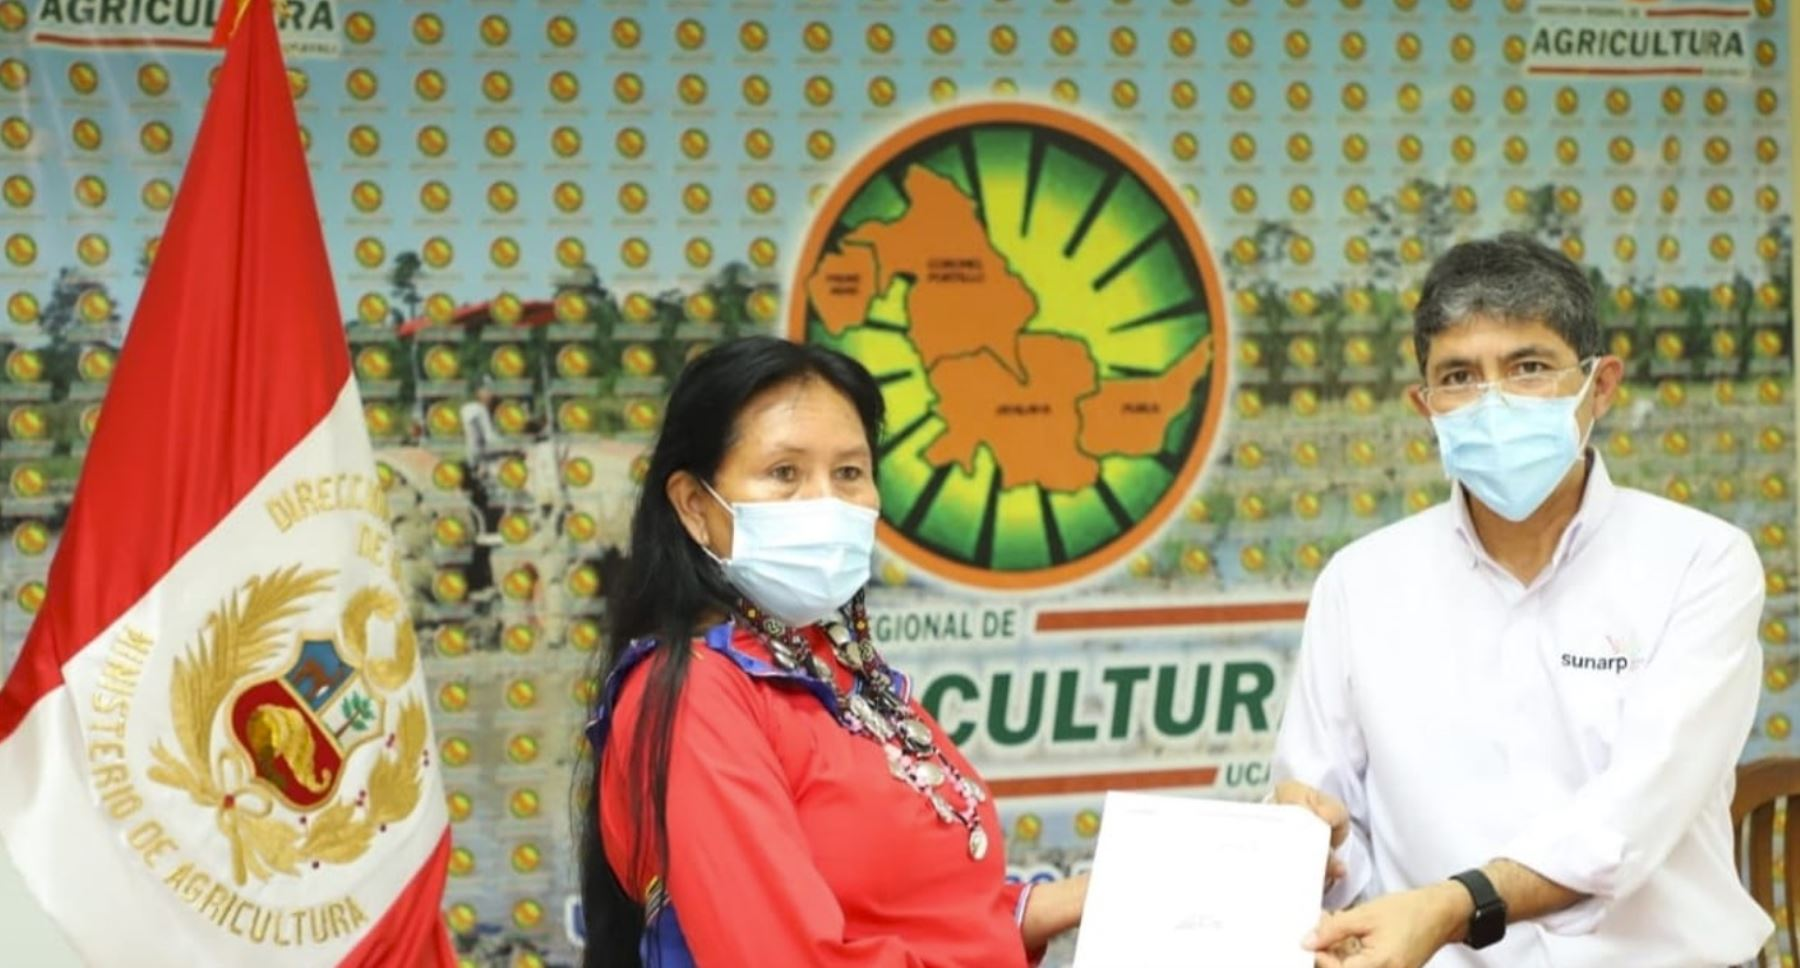 Pucallpa: Sunarp capacitó a mujeres nativas emprendedoras para formalizar sus negocios